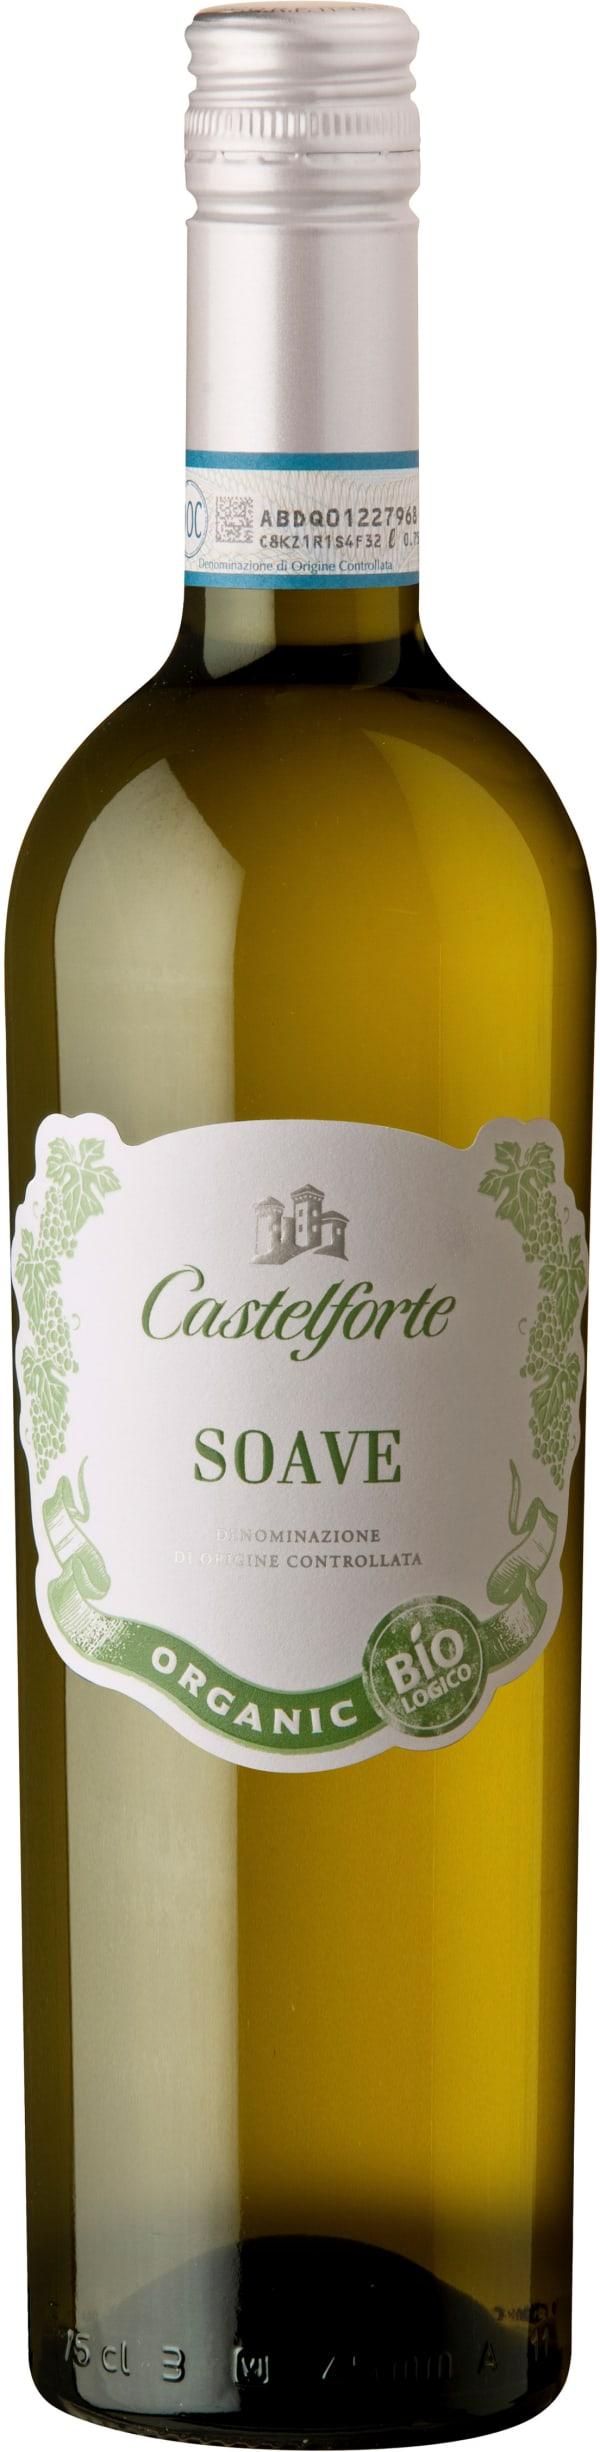 Castelforte Soave Organic  2017